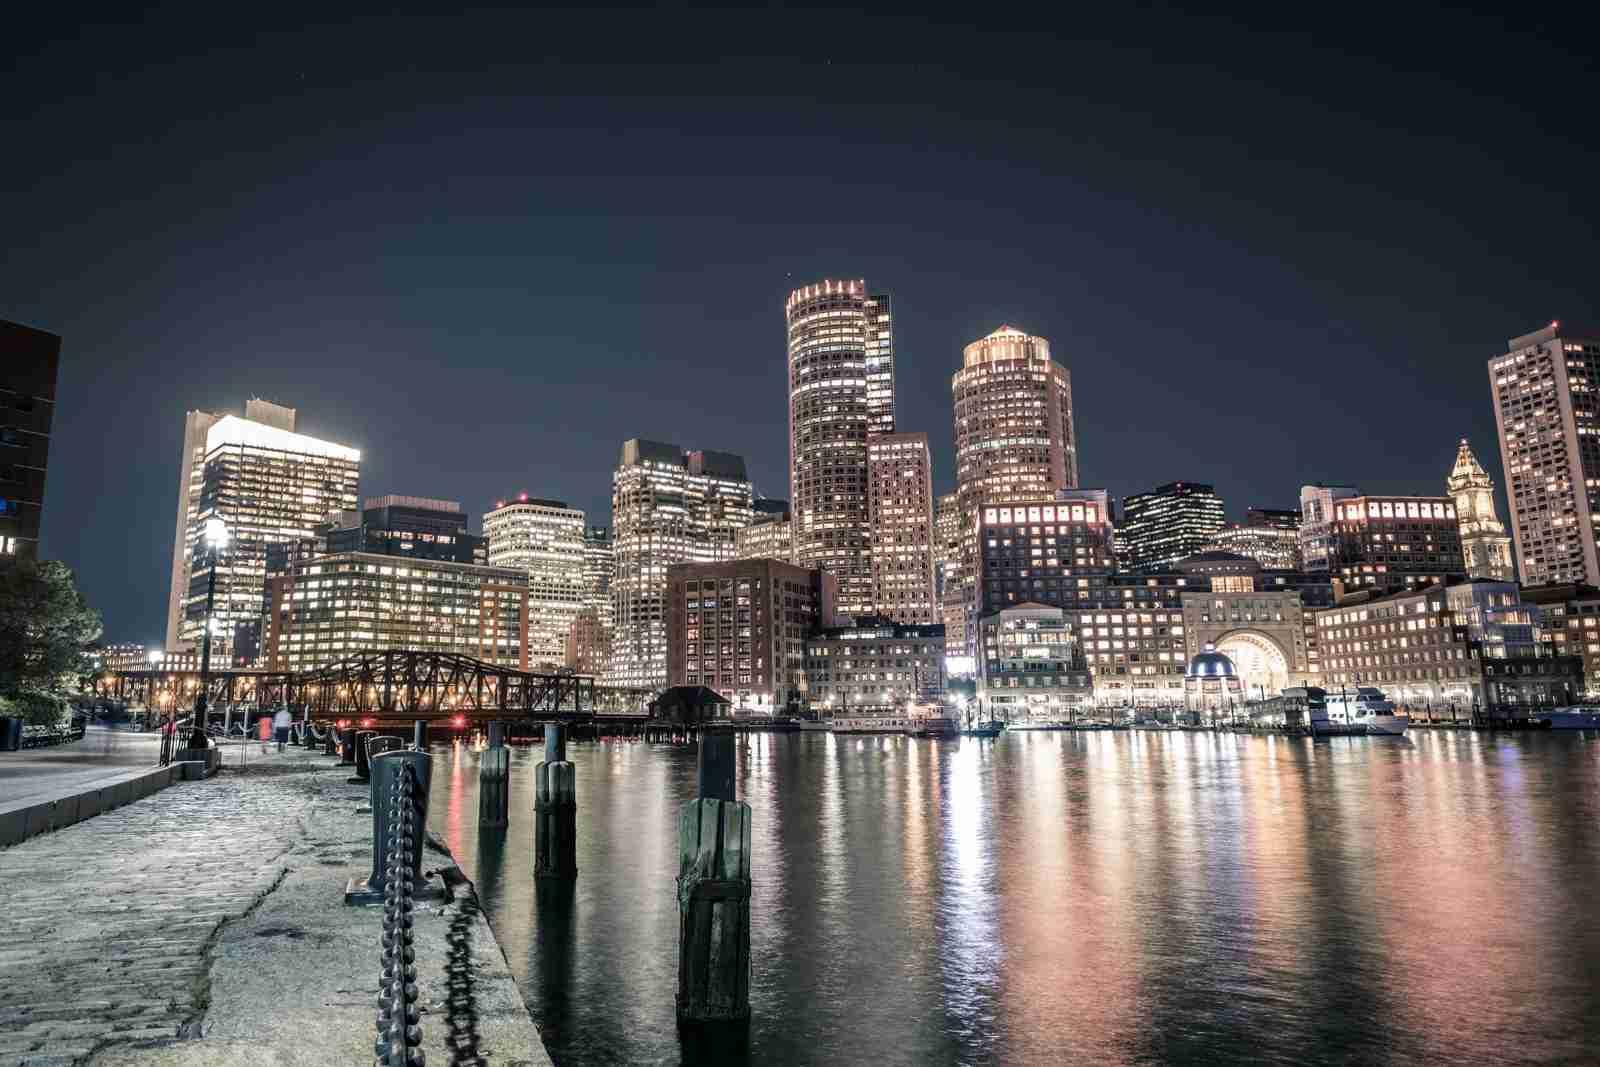 Boston Skyline. (Photo by lance anderson / Unsplash)